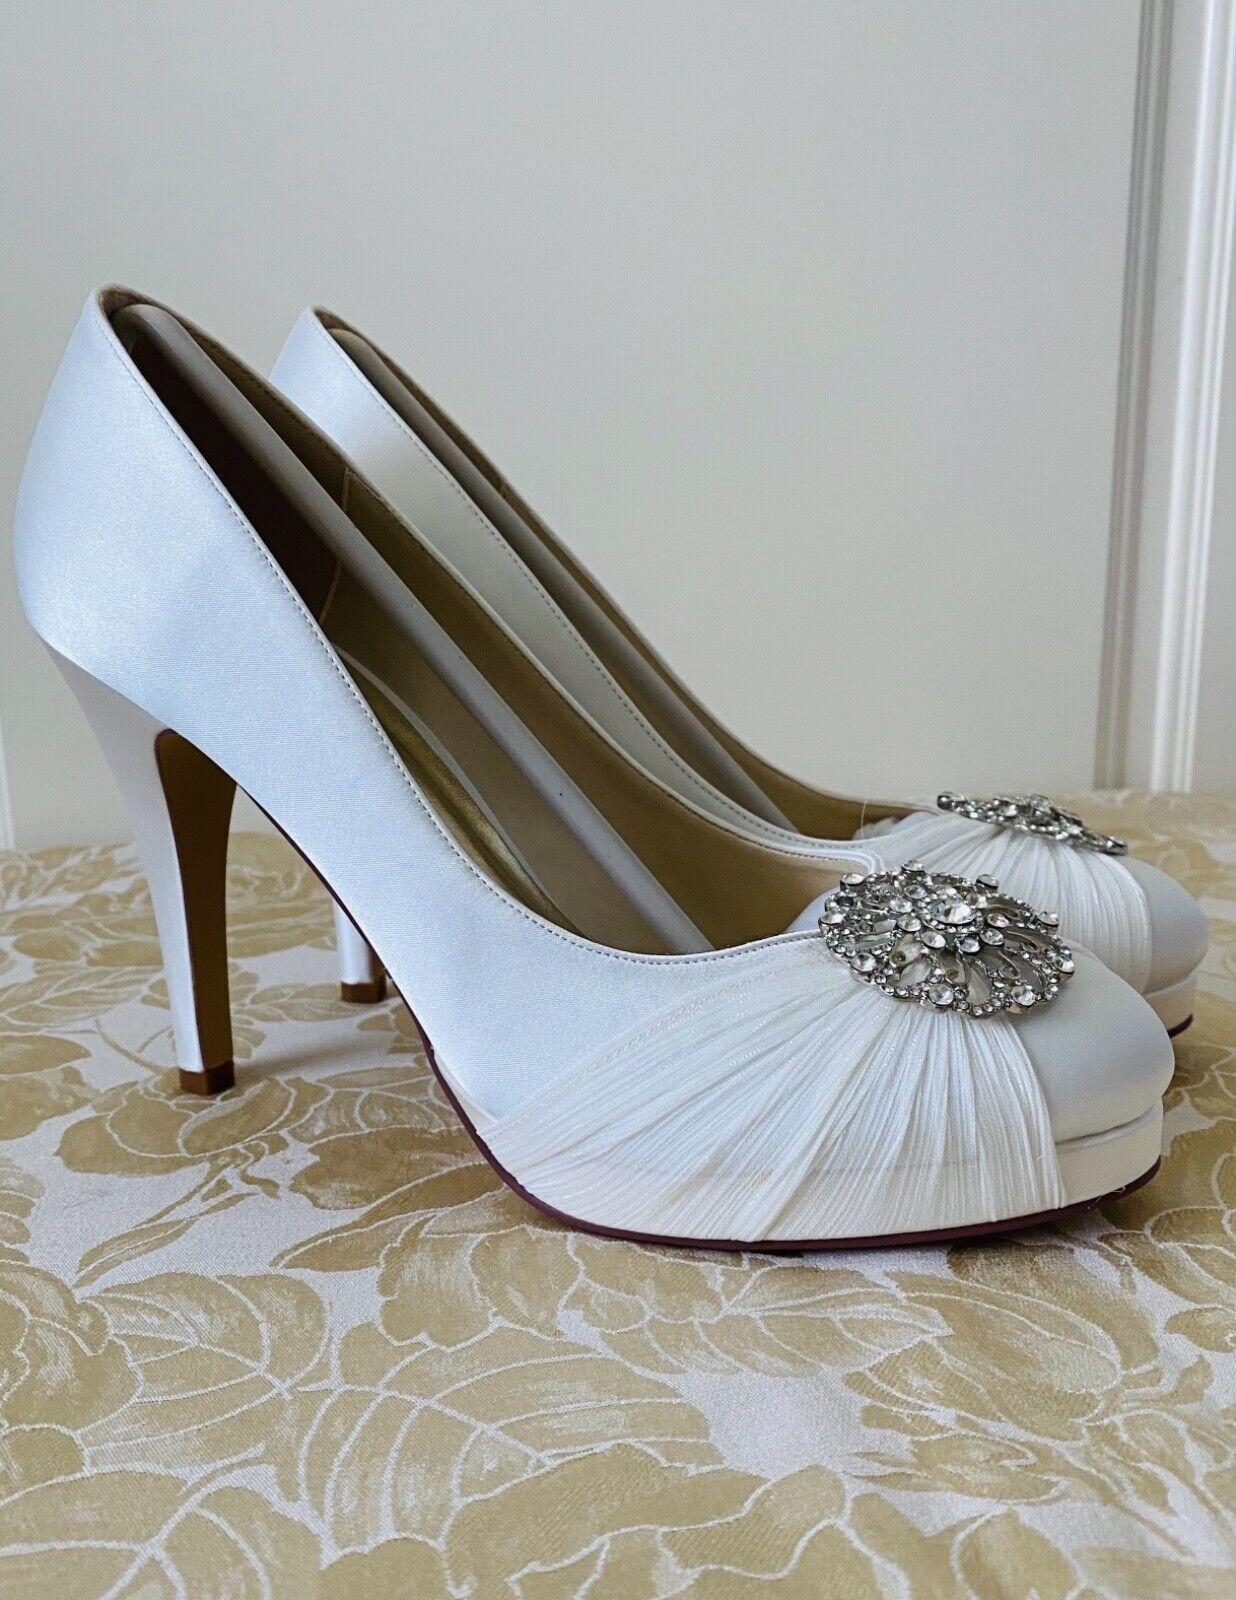 Ivory Satin Bridal Wedding Shoes Size 7, New, Rhinestone Brooch on Toe